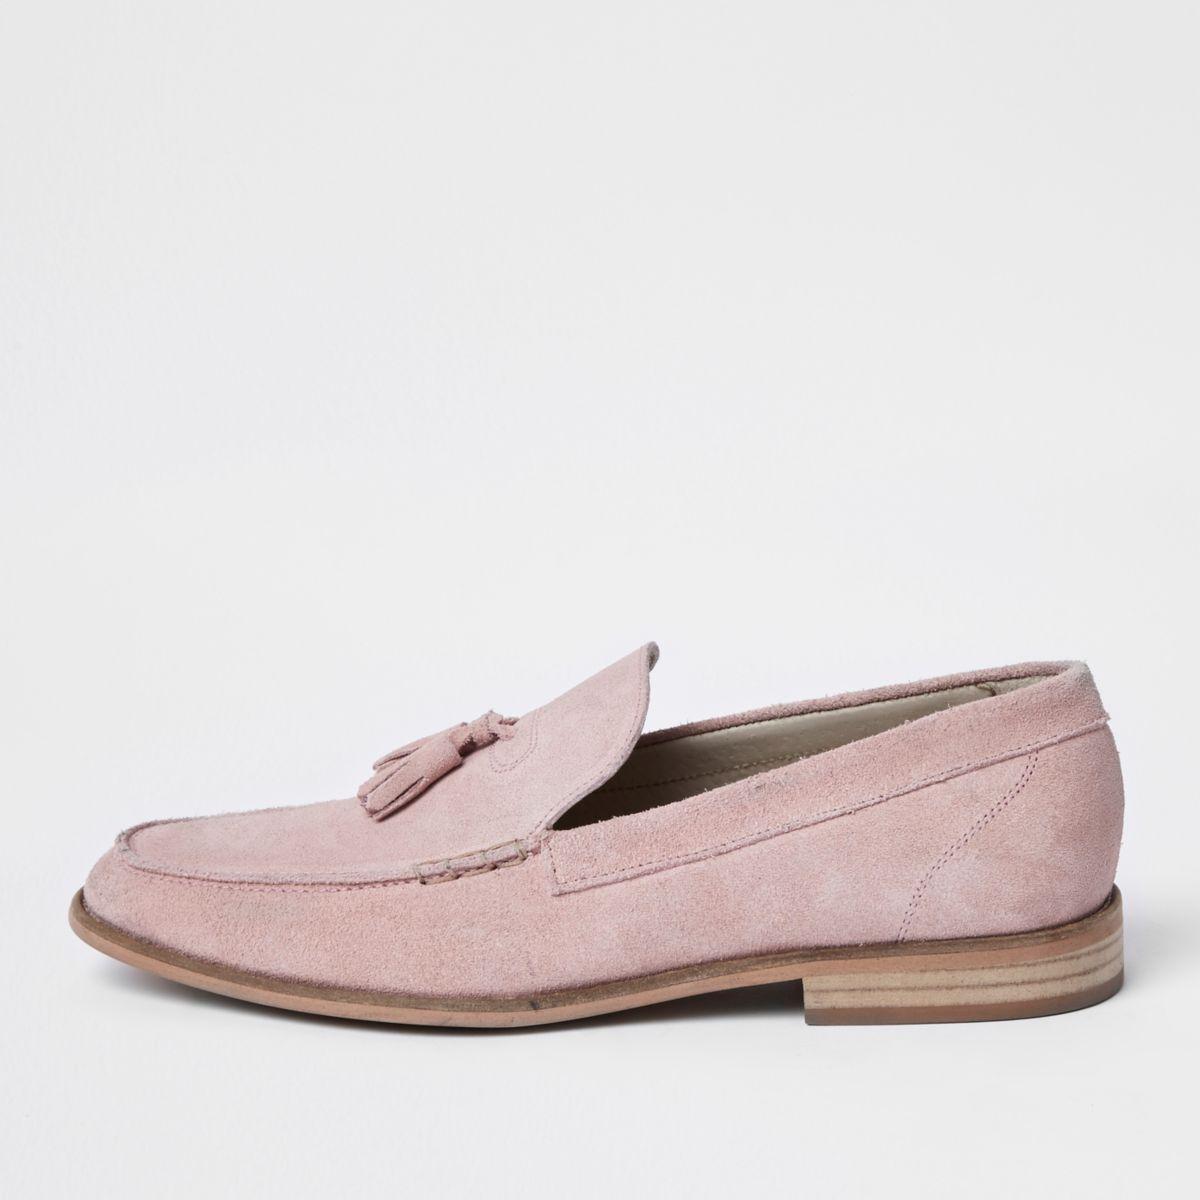 Light pink suede tassel loafers